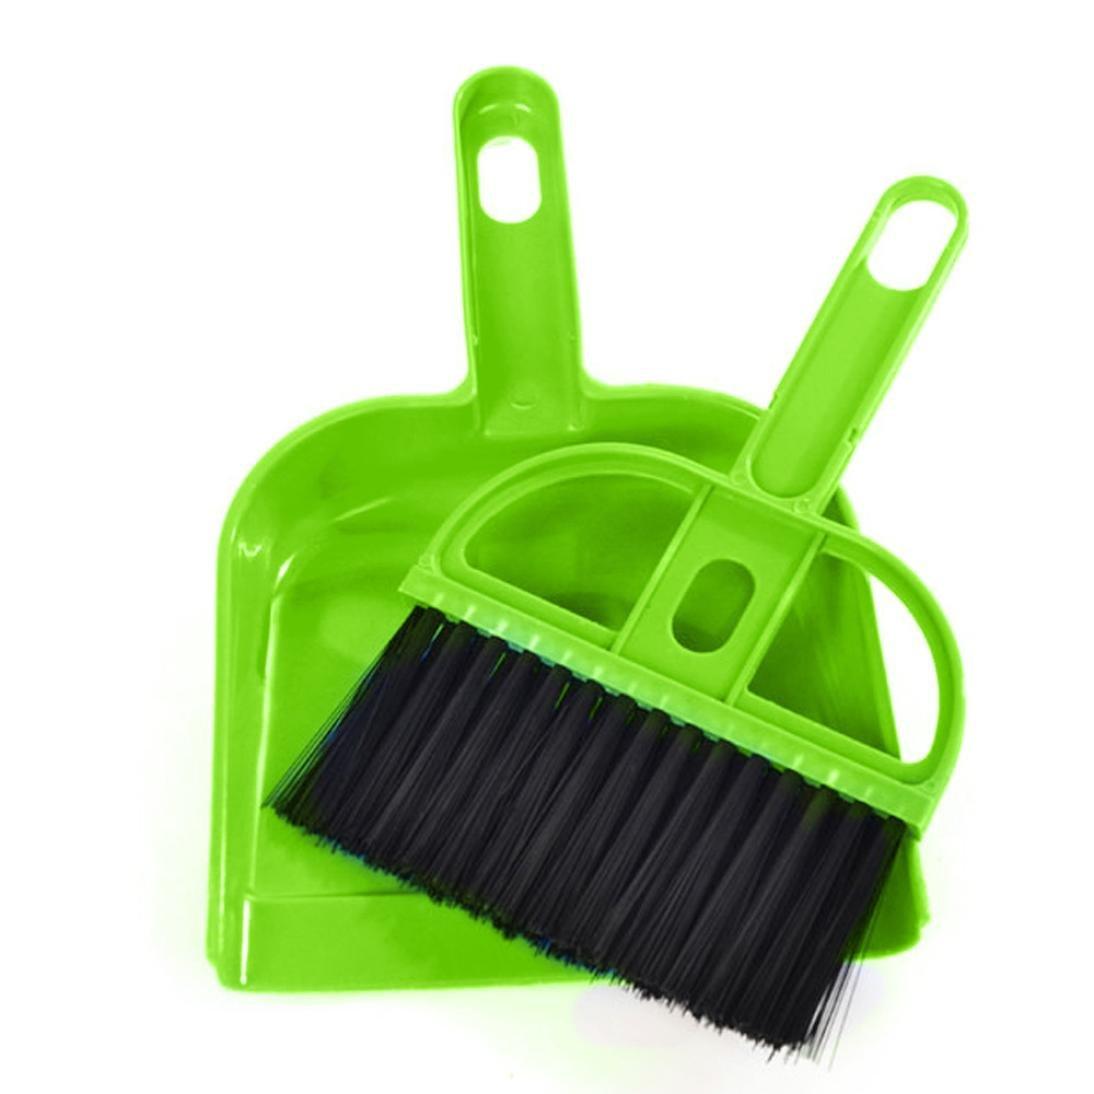 Mini Dust Pan And Brush Set, Transer Dust Sweeper Desktop Cleaning Brush Whisk Broom and DustPan (Green)